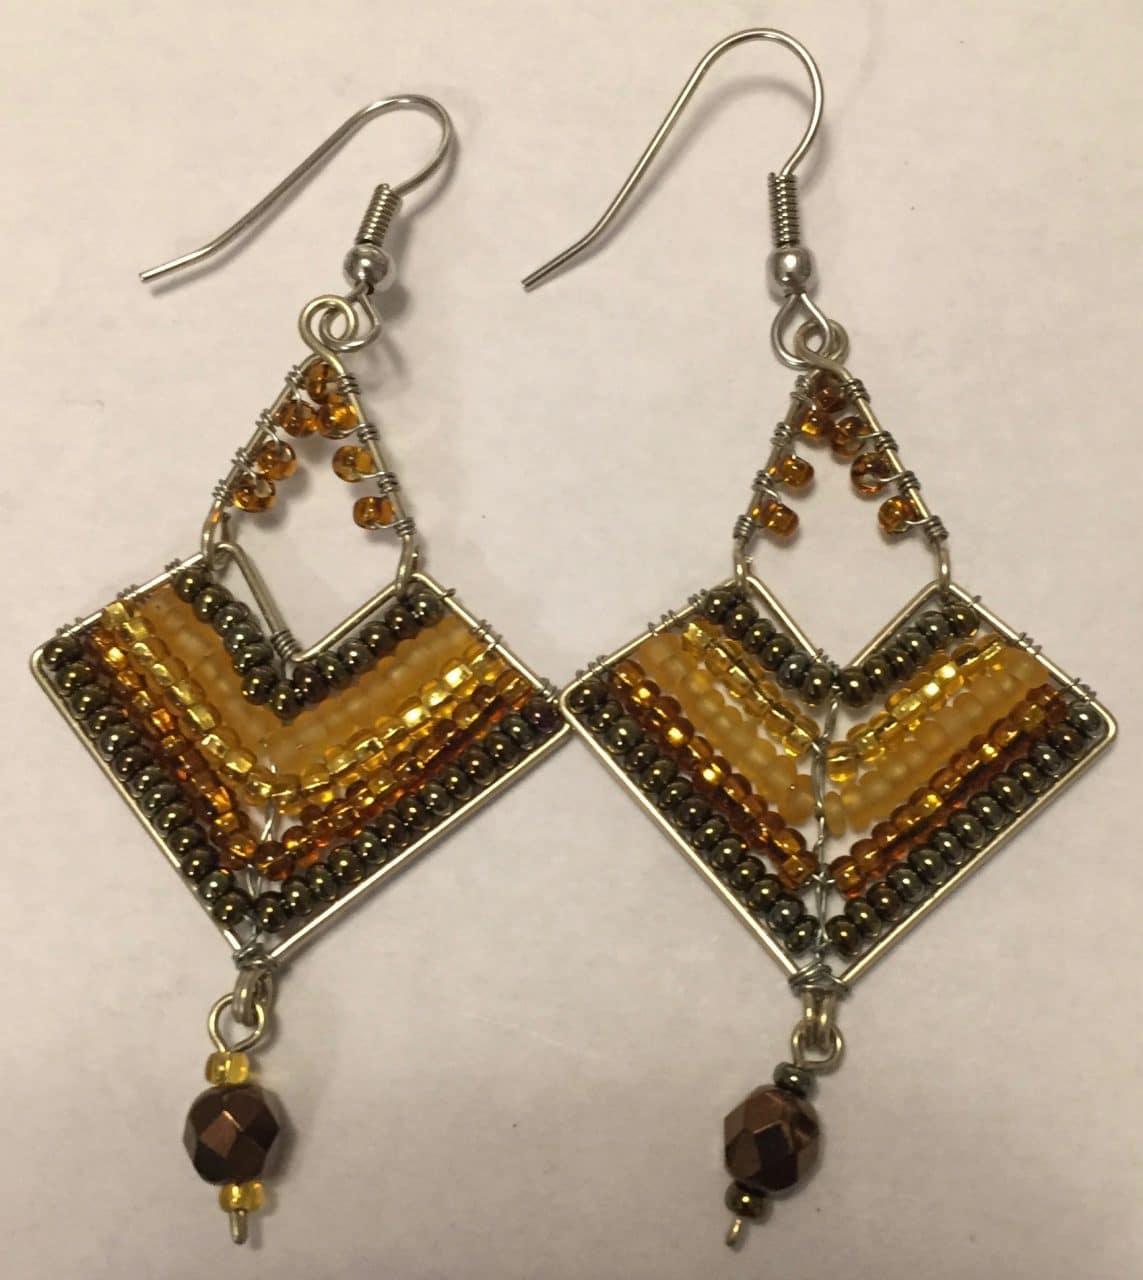 Chevron Earrings - Golds